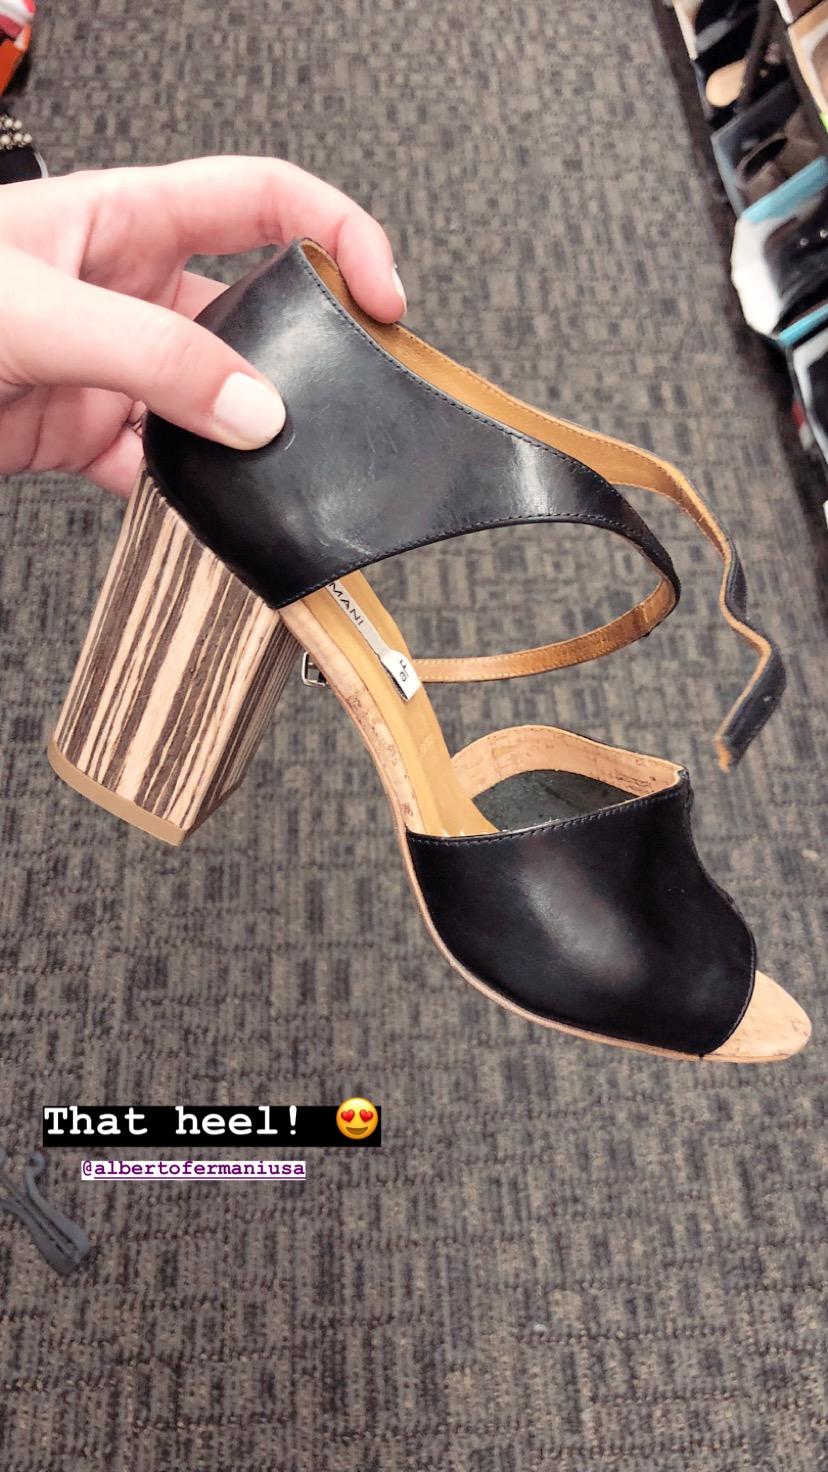 birchcollective-shop-instagram-story-july-7-2018-Alberto-fermani-sandals